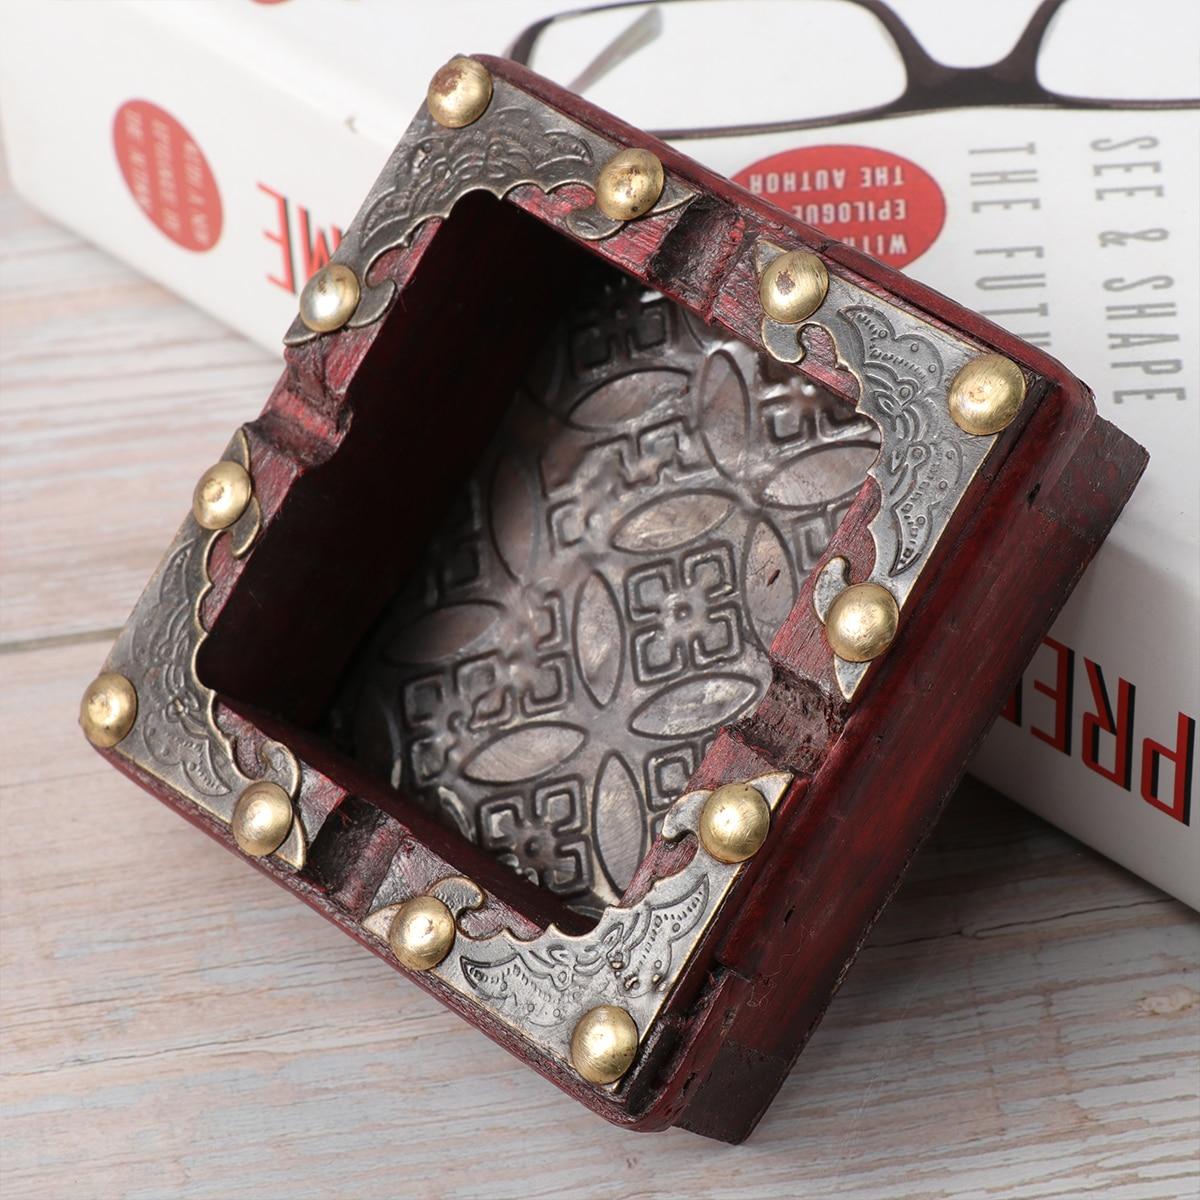 Cigarette Ashtray Creative Wooden Fashion Ash Holder Storage Box Ashtray for Restaurant Office